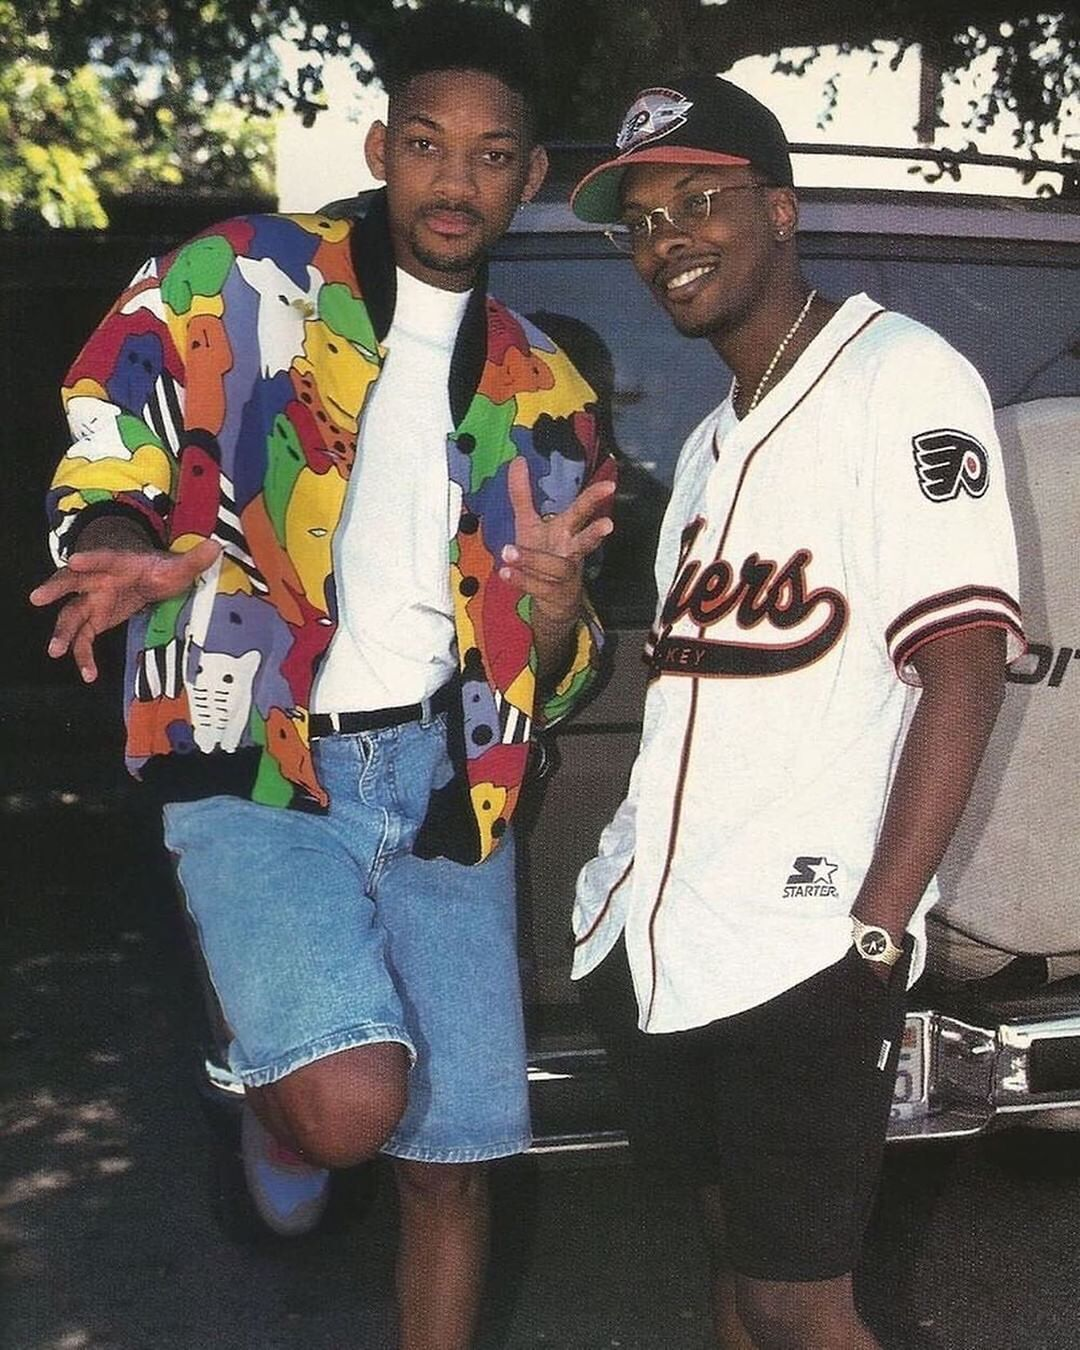 Getemvintage Got The Best Vintage Clothing For Sale 90s Fashion Men 90s Fashion 90s Hip Hop Fashion